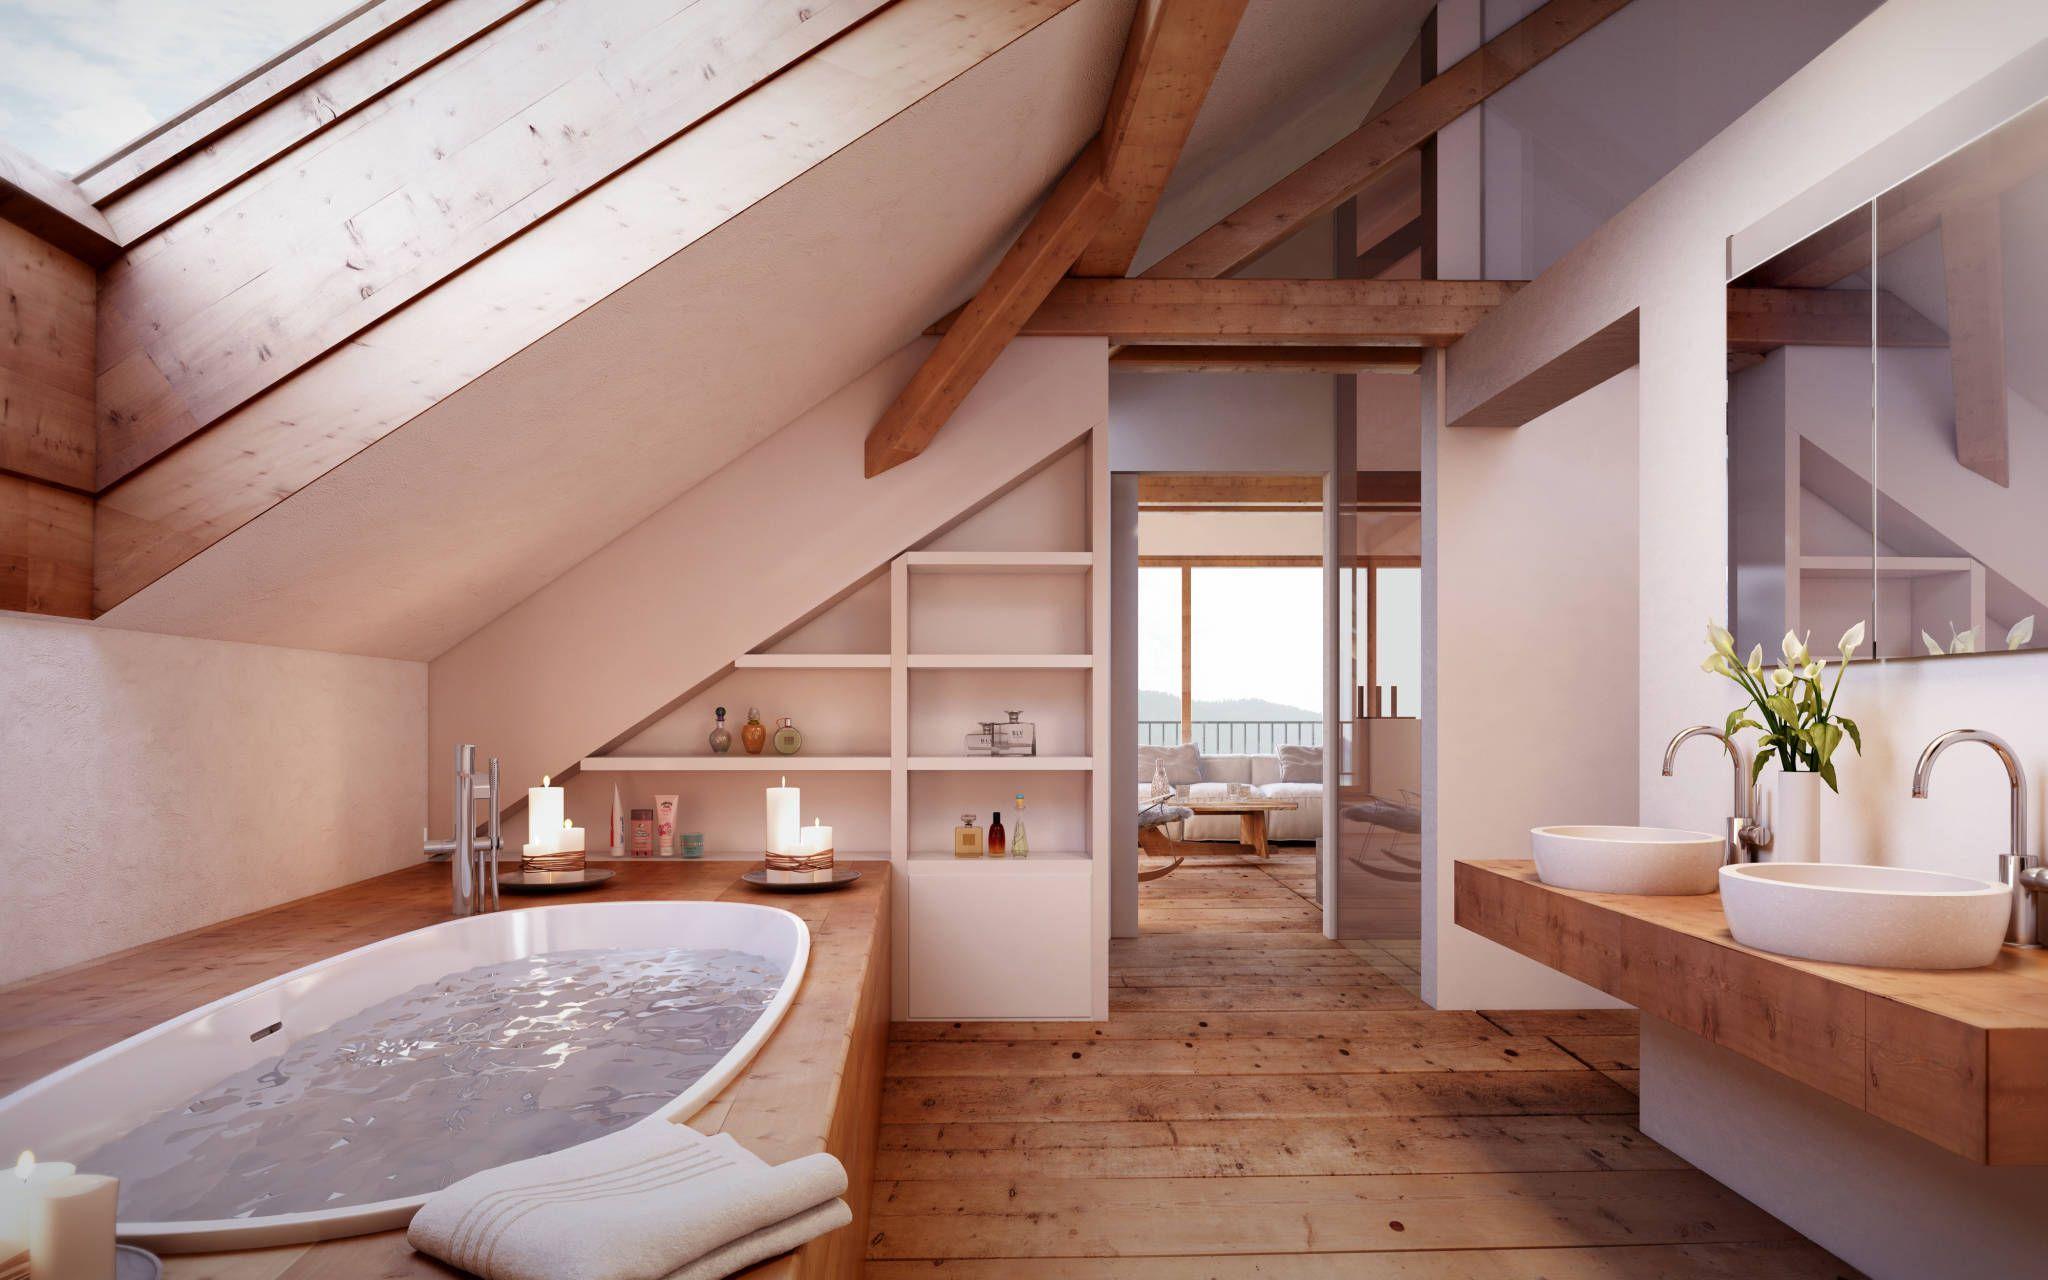 Latest Pic Rustic Bathroom Ceiling Popular Badezimmer Dachgeschoss Badezimmer Rustikal Rustikale Bader